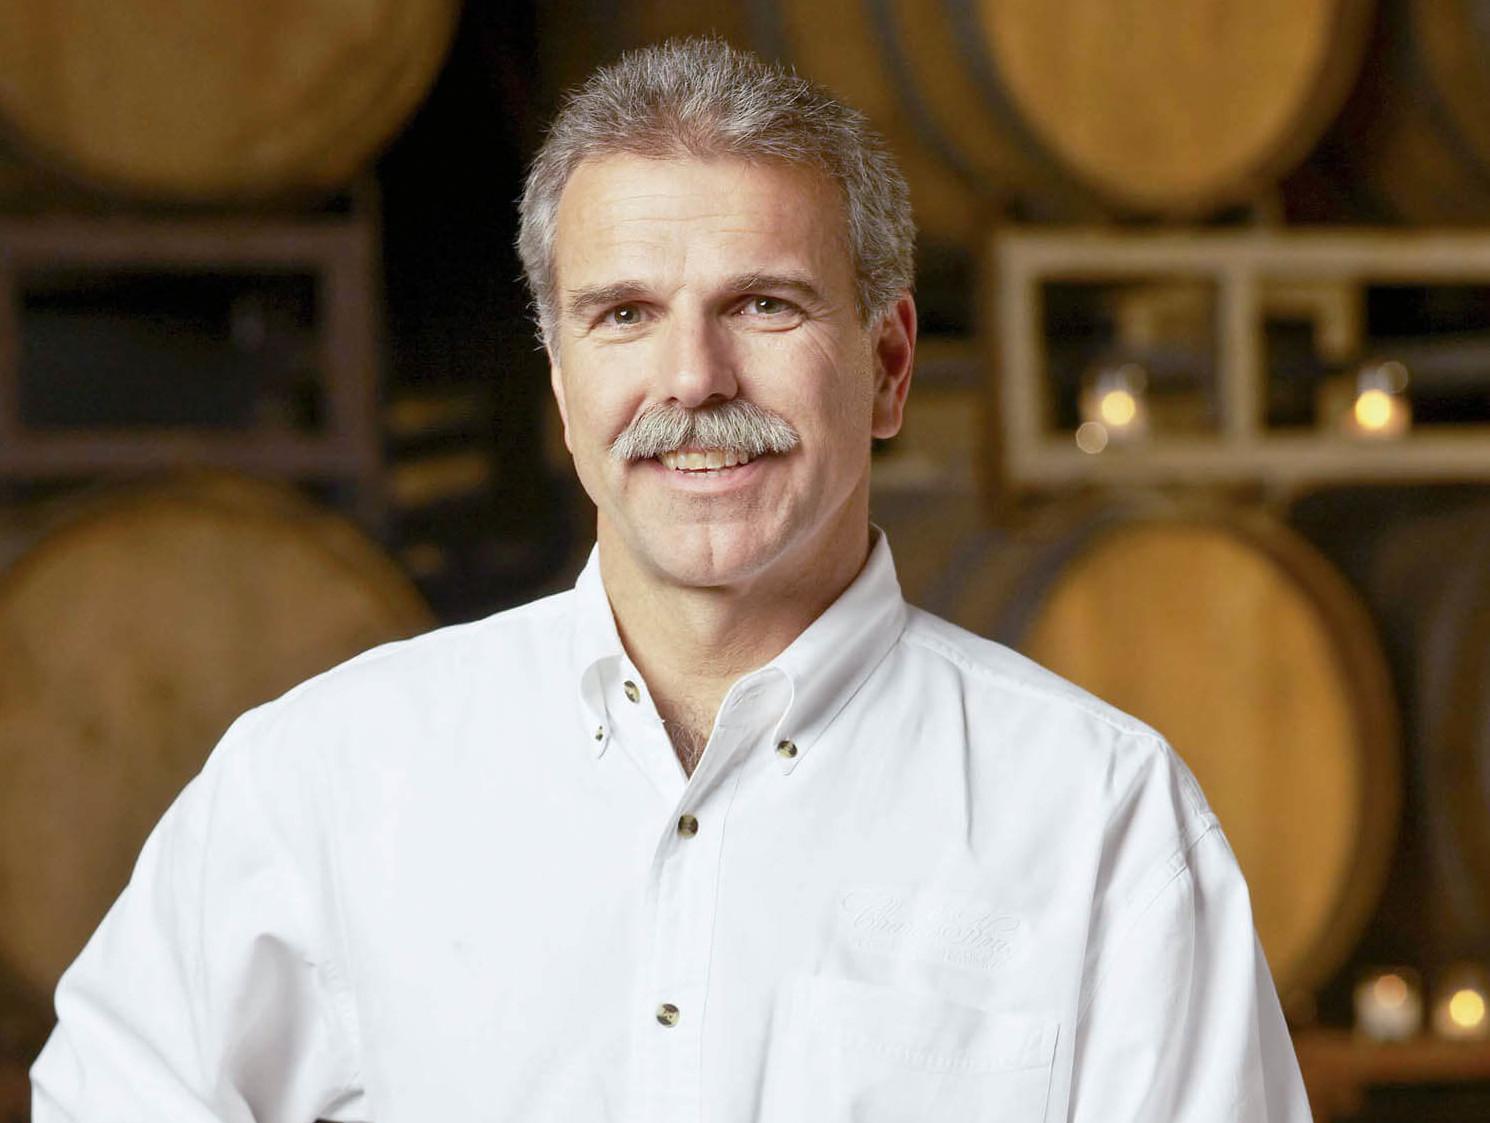 Peter Mondavi, Jr.<br />(Co-Proprietor at Charles Krug Winery)